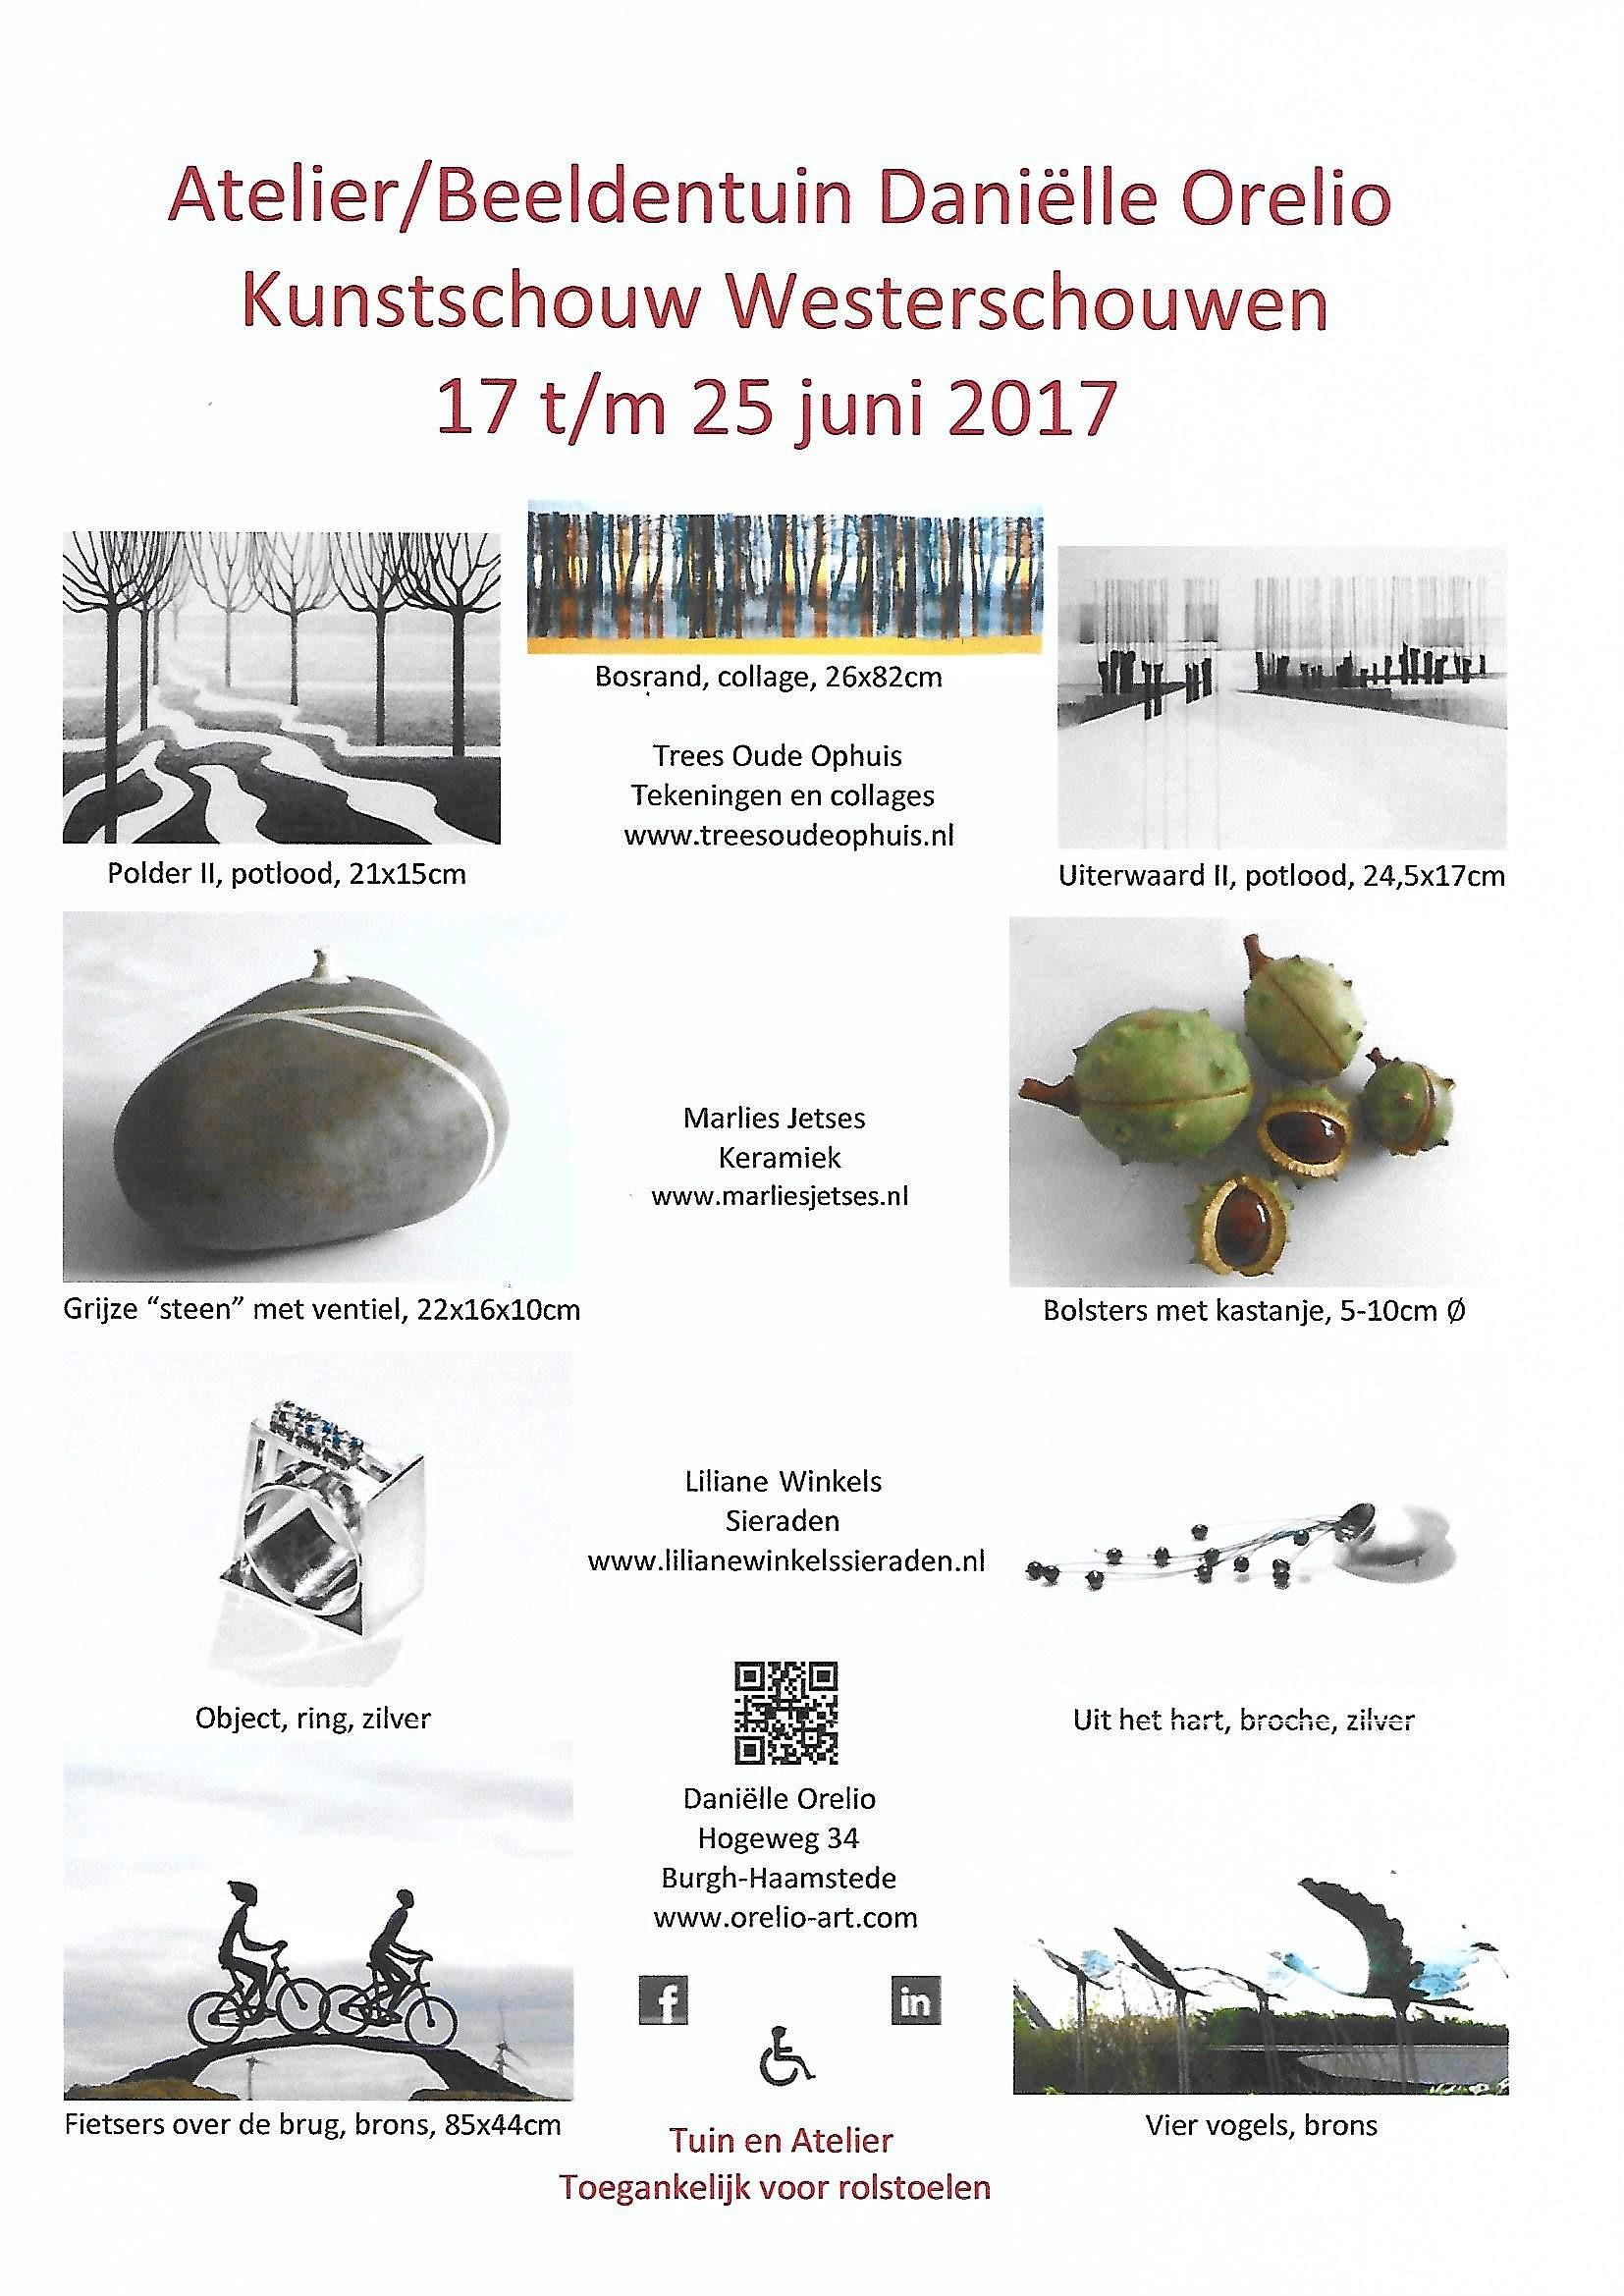 Affiche kunstschouw scan marlies